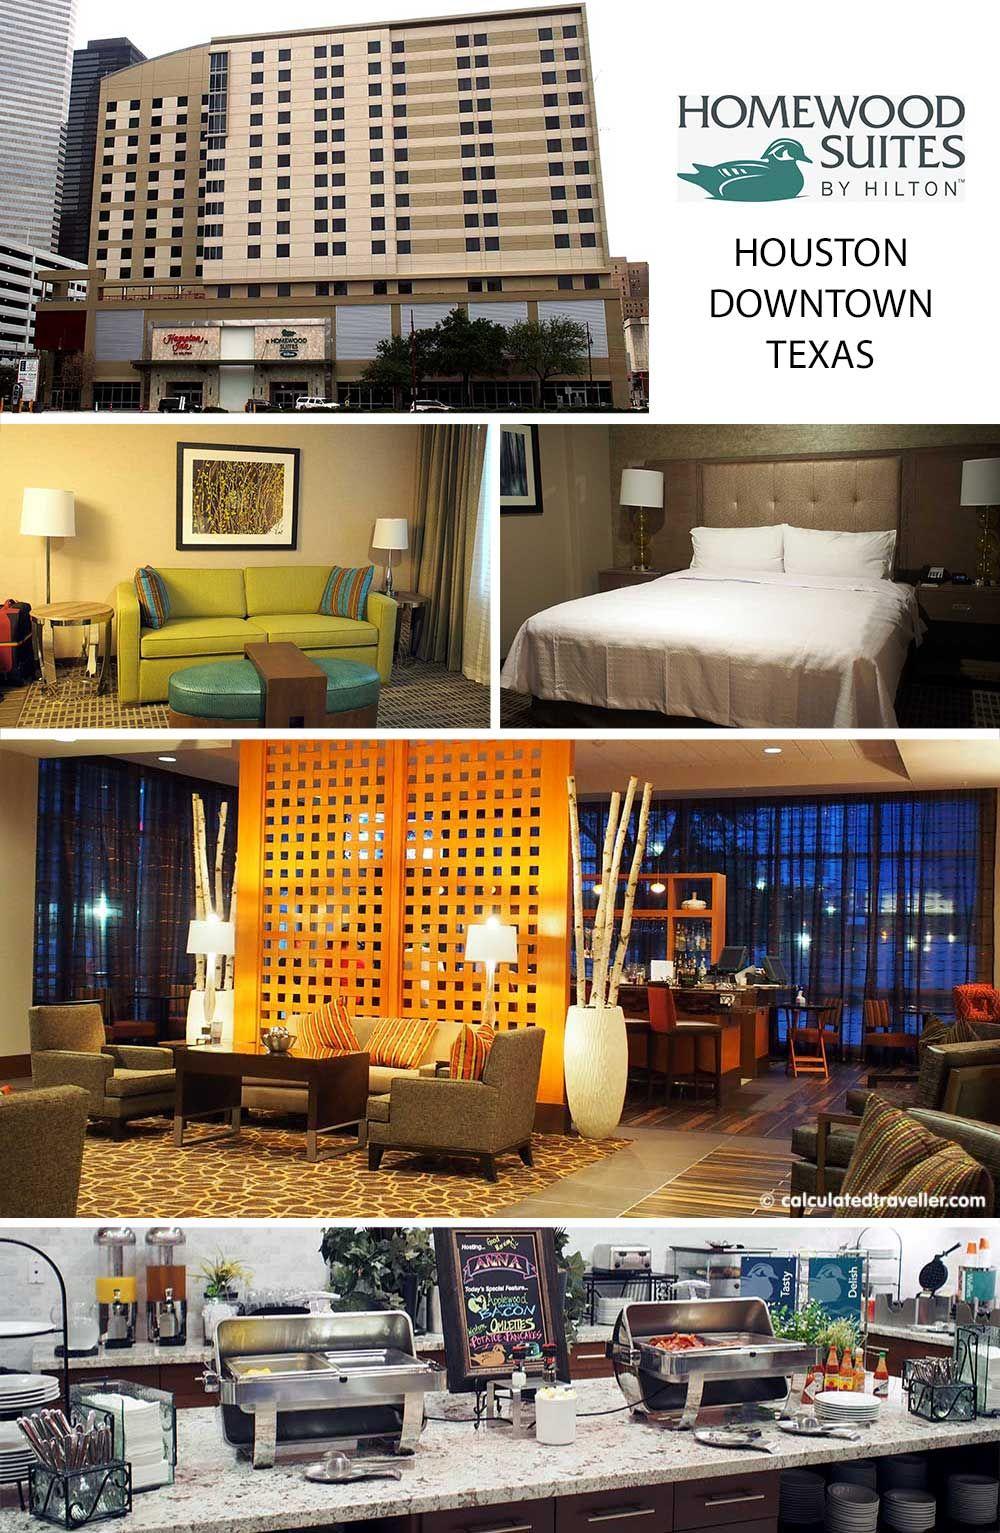 homestead studio suites houston / galleria area - compare deals